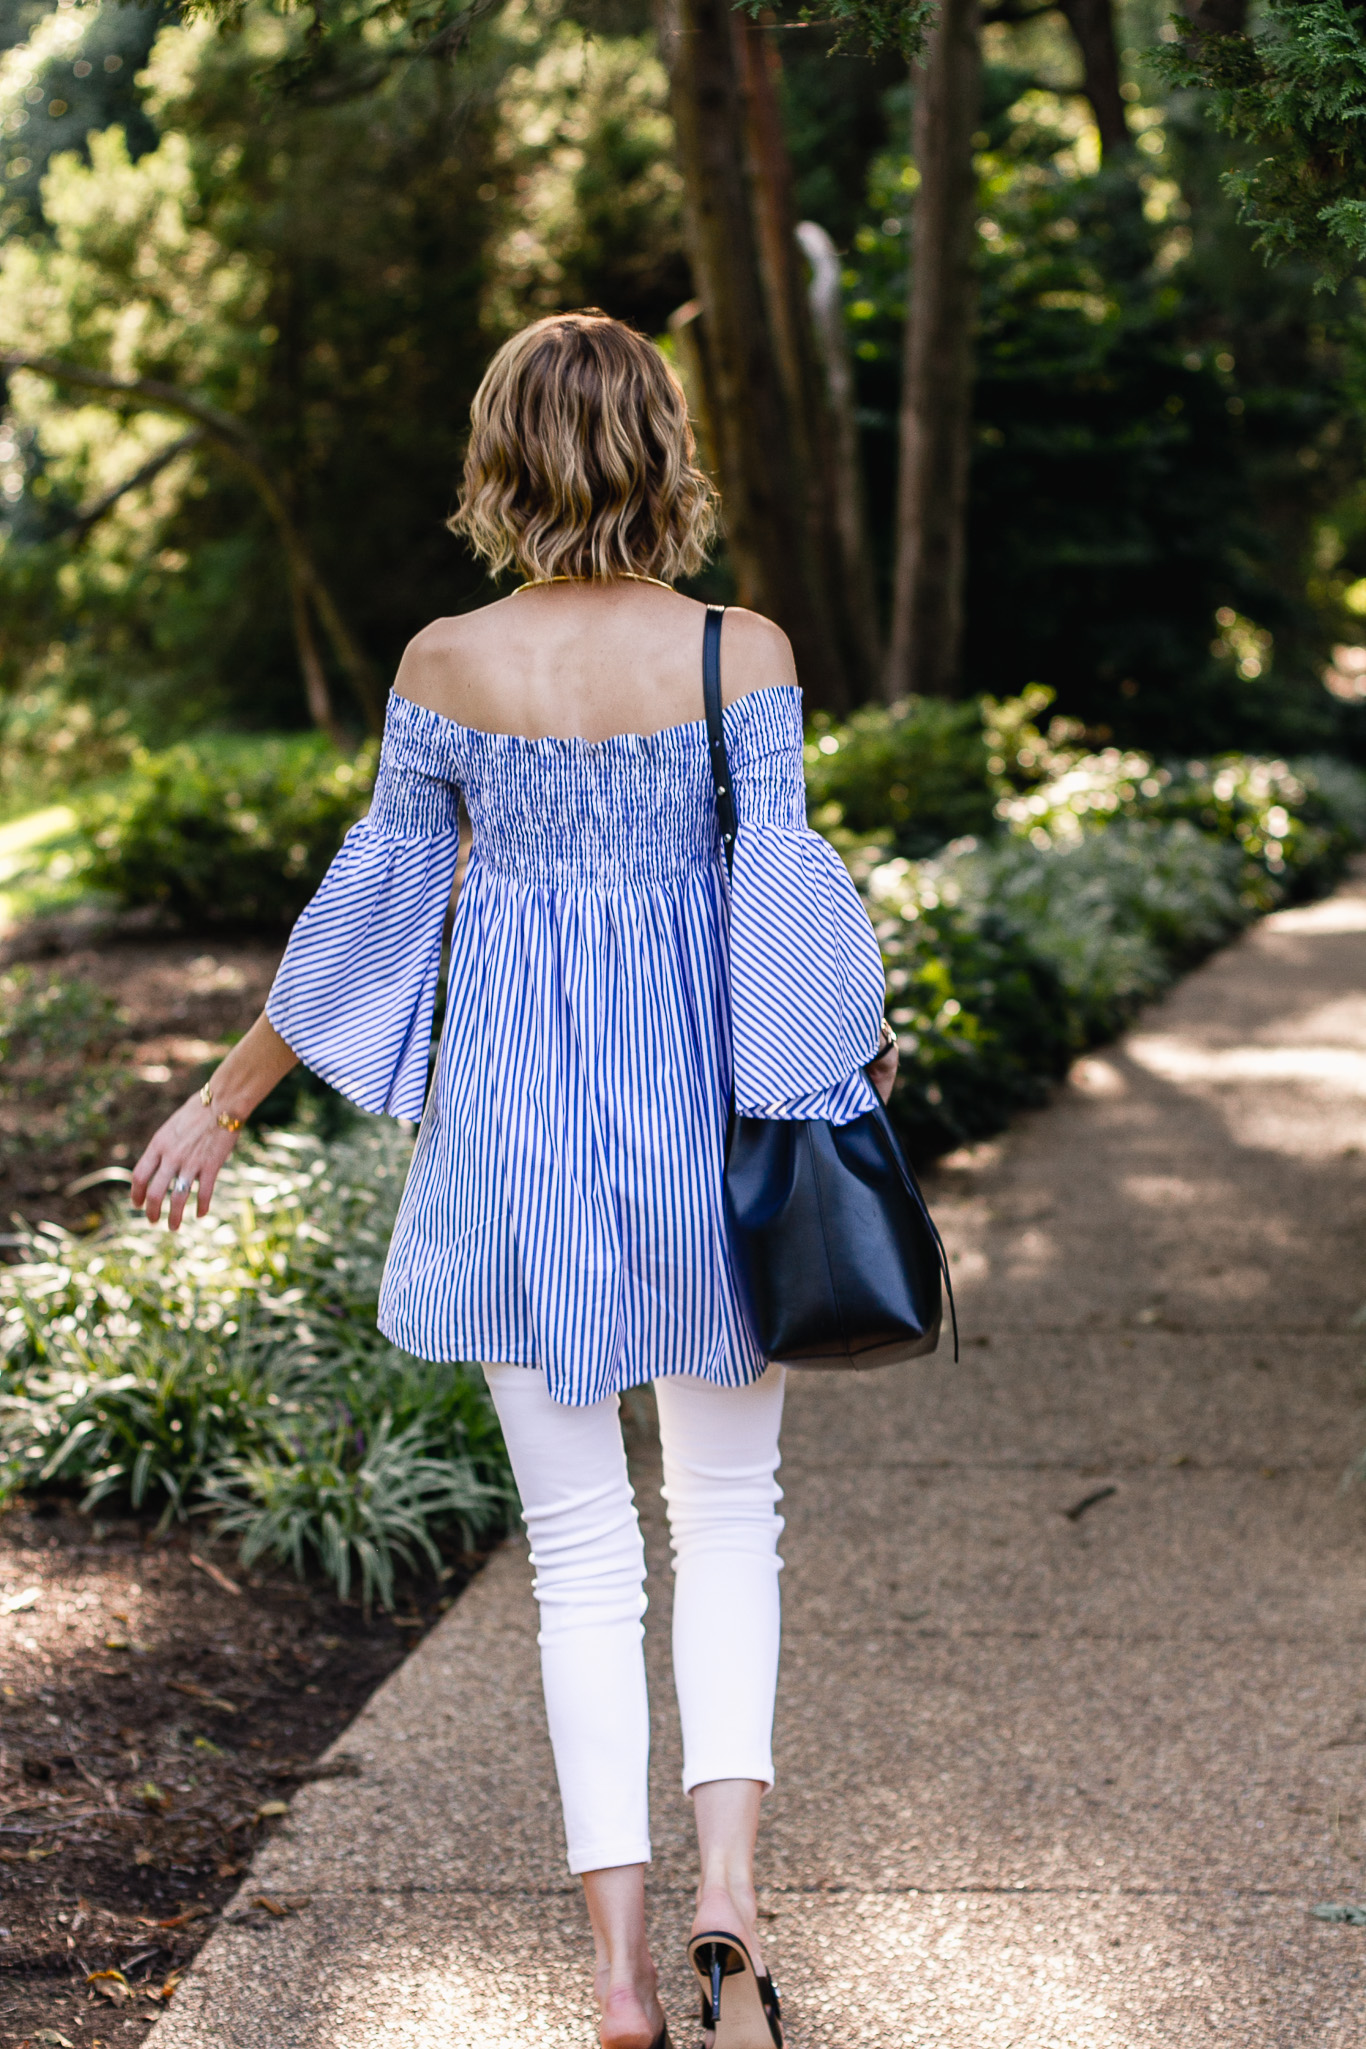 Zara bell sleeve top and St. John white pants